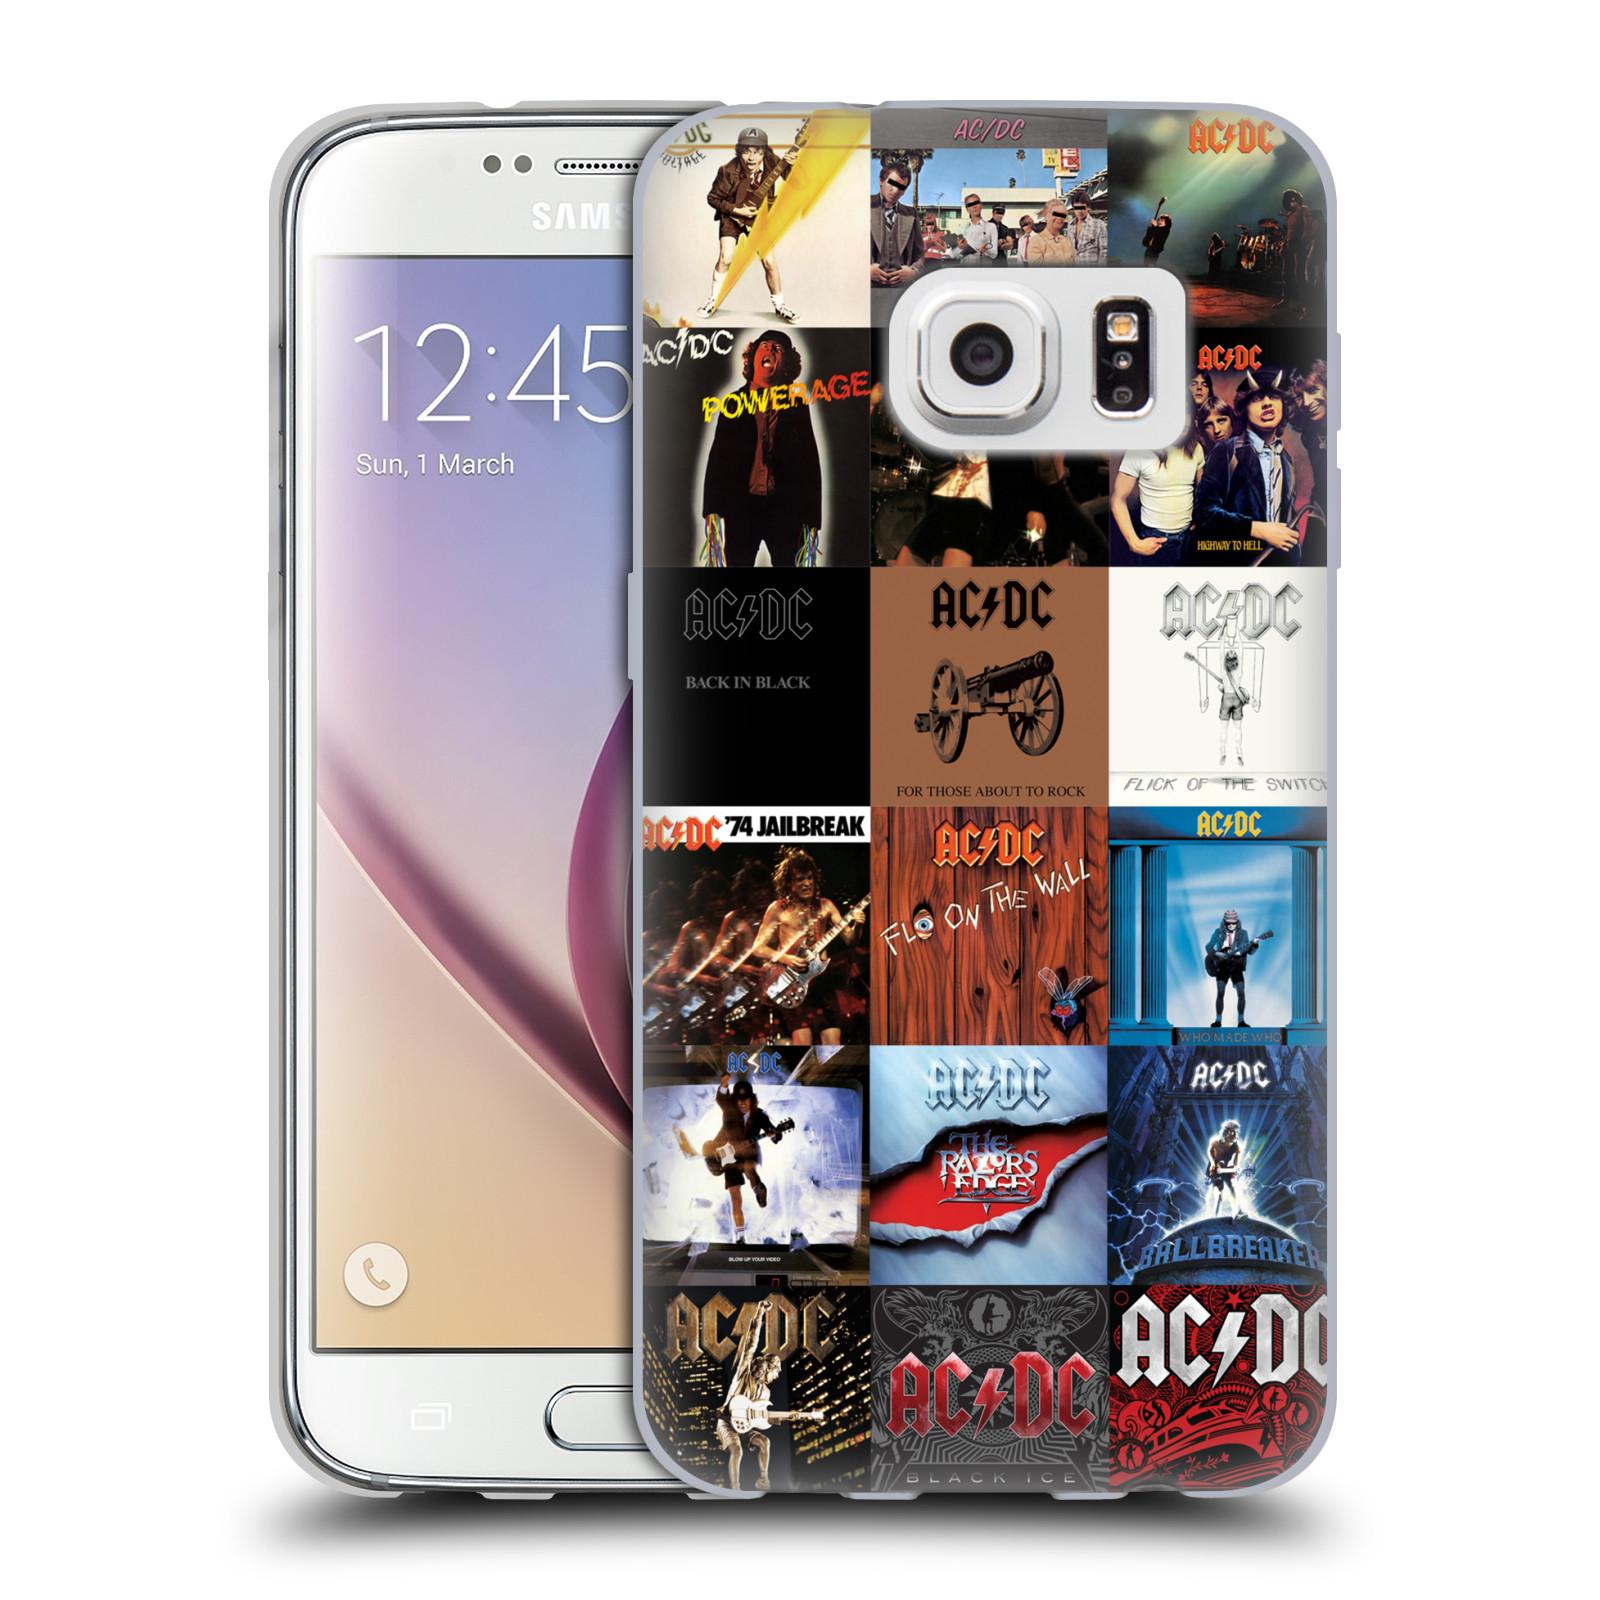 HEAD CASE silikonový obal na mobil Samsung Galaxy S7 rocková skupina ACDC seznam alba